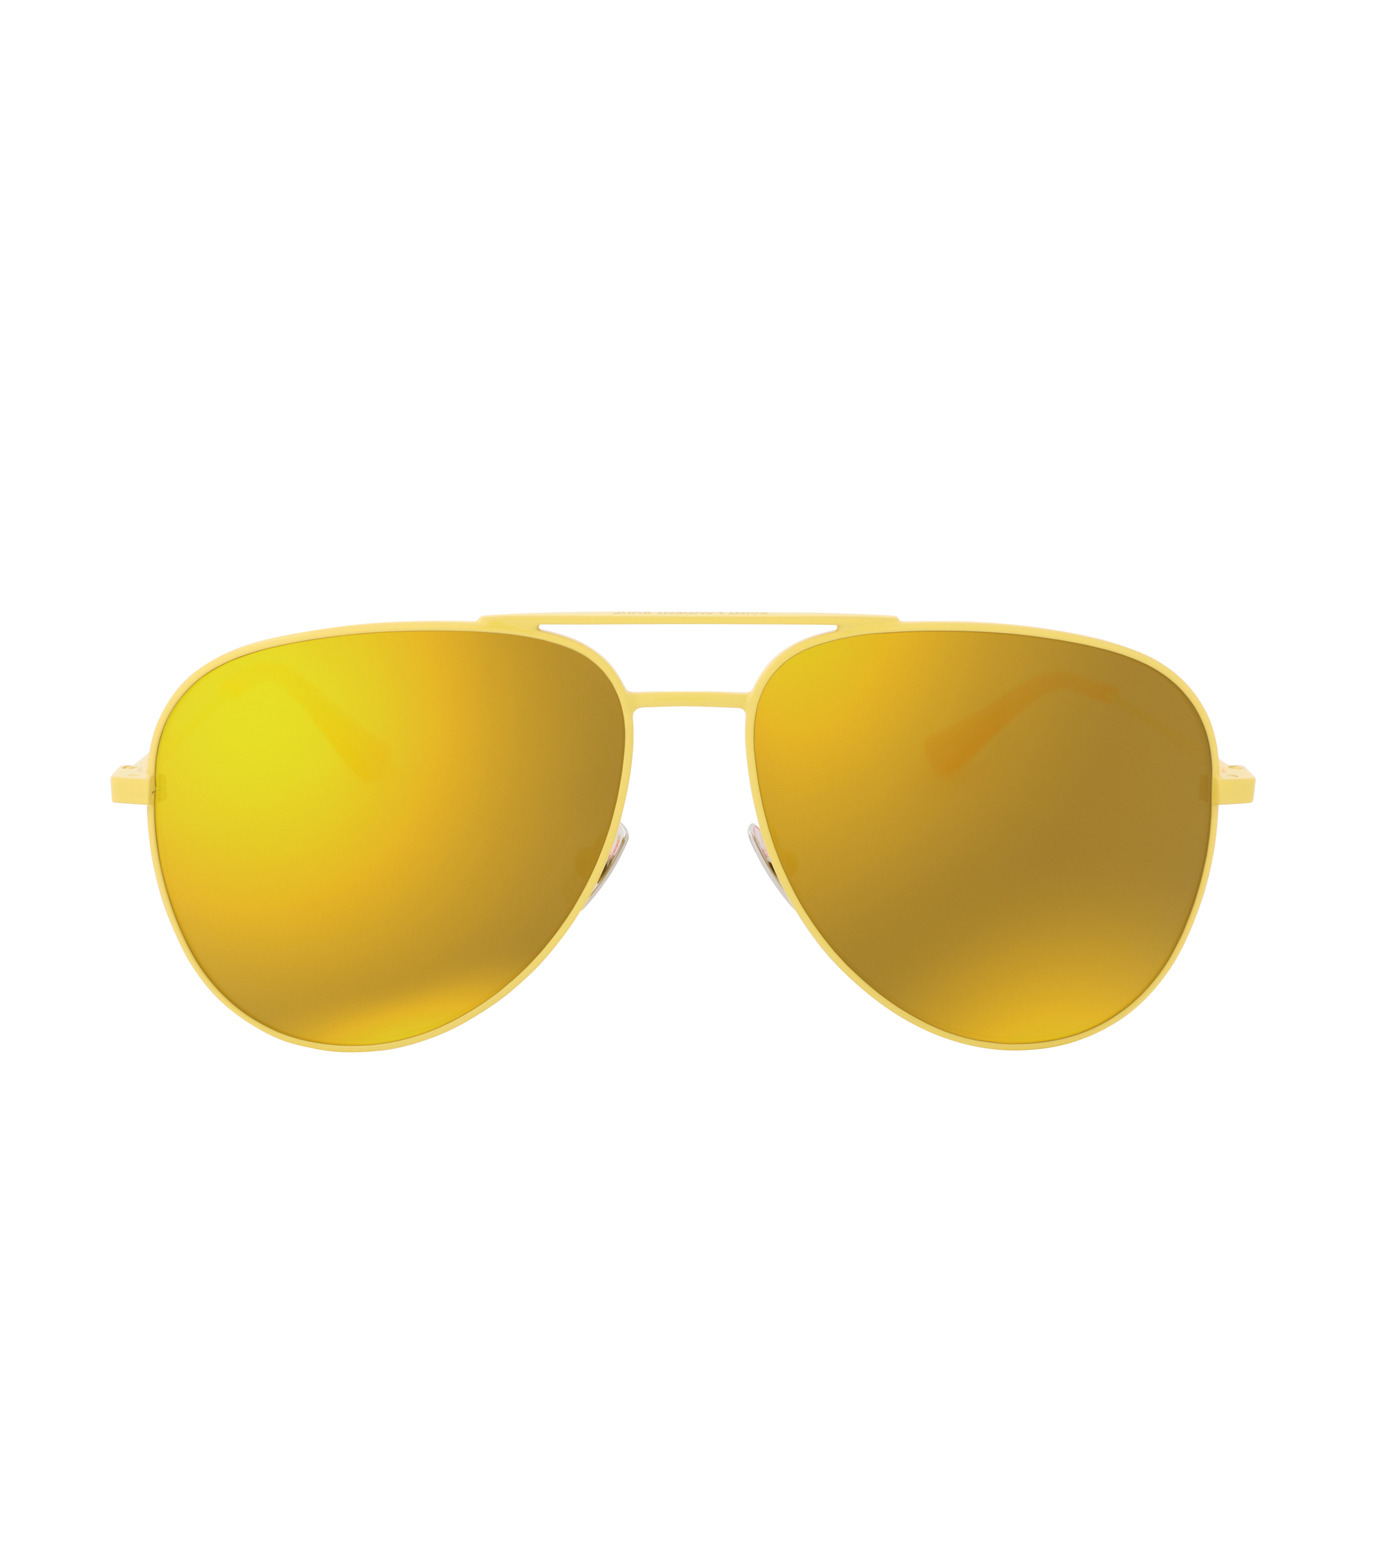 SAINT LAURENT(サンローラン)のTeardrop-YELLOW(アイウェア/eyewear)-427758-Y9902-32 拡大詳細画像3